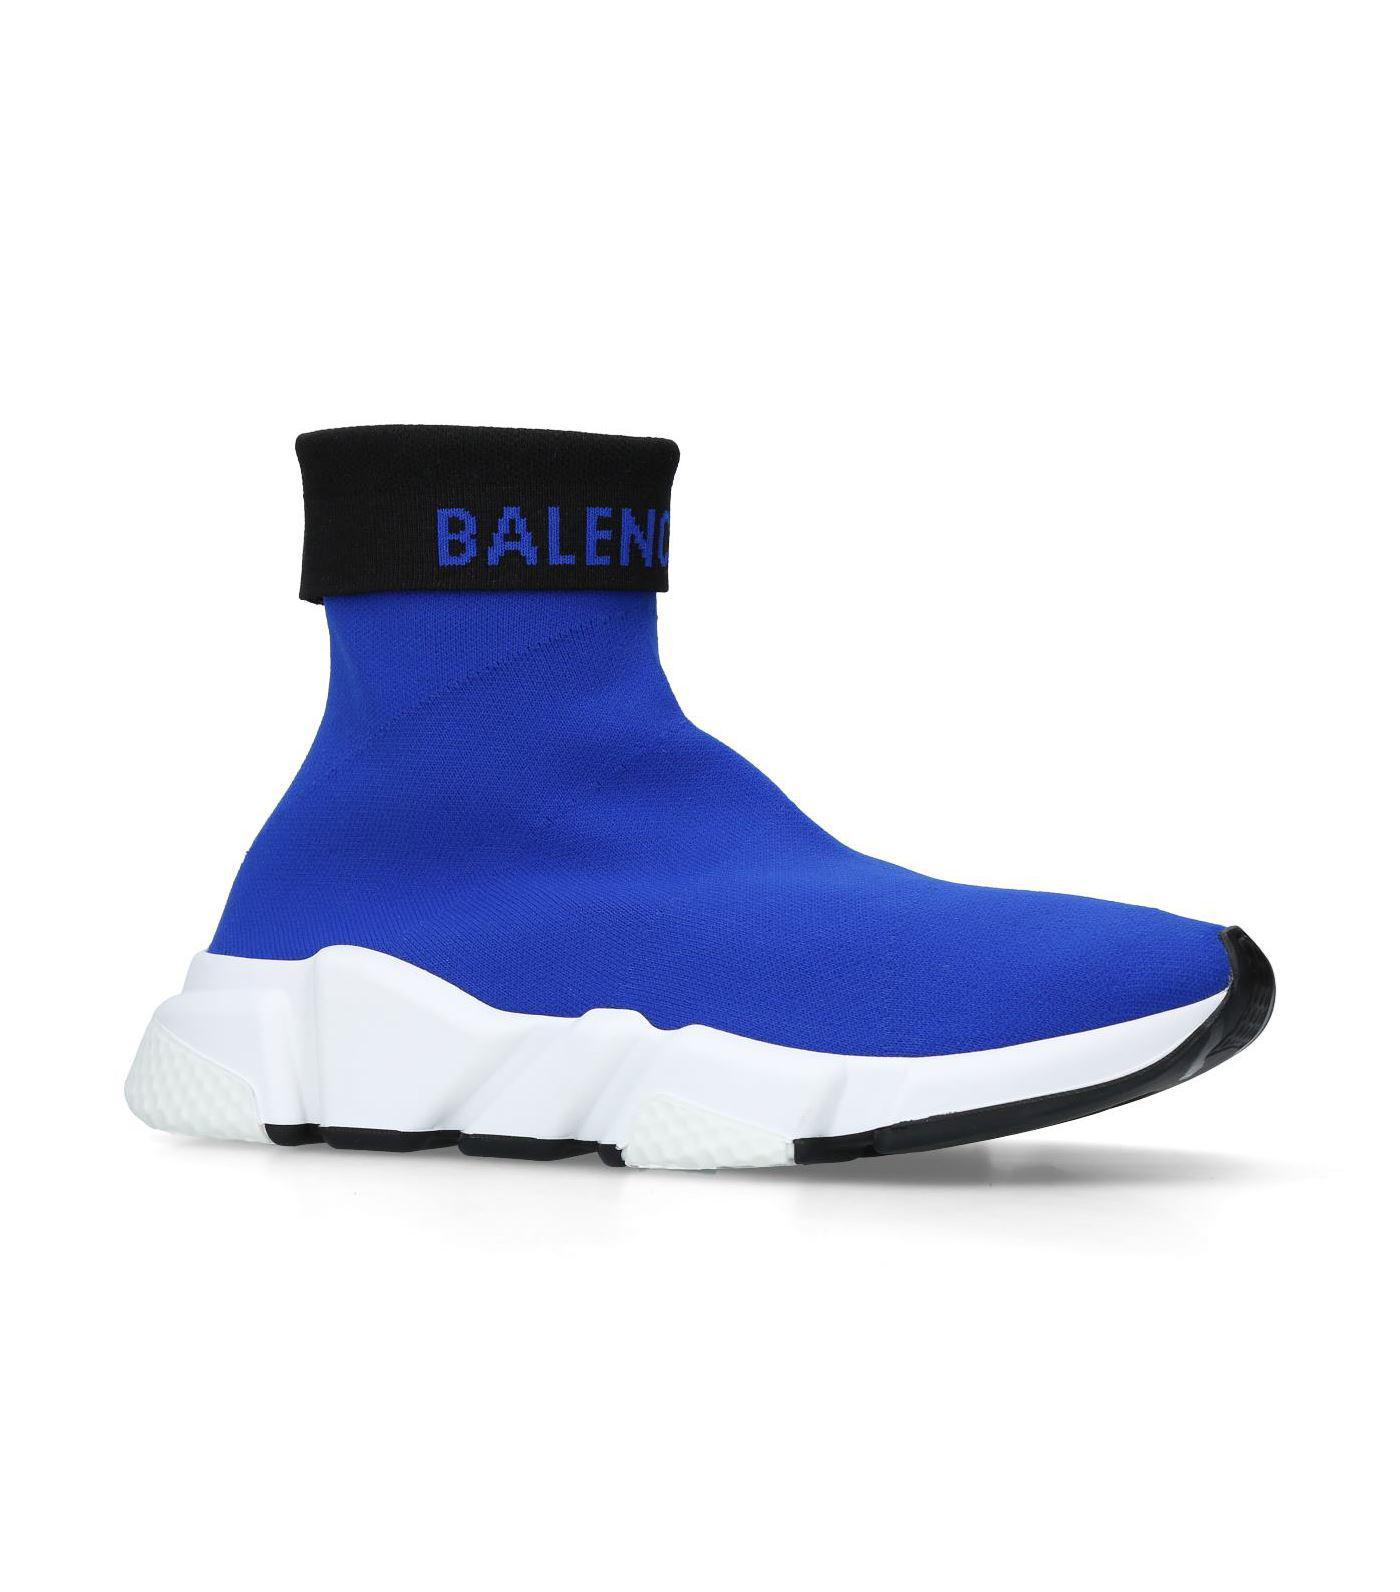 Balenciaga Speed High-top Sneakers in